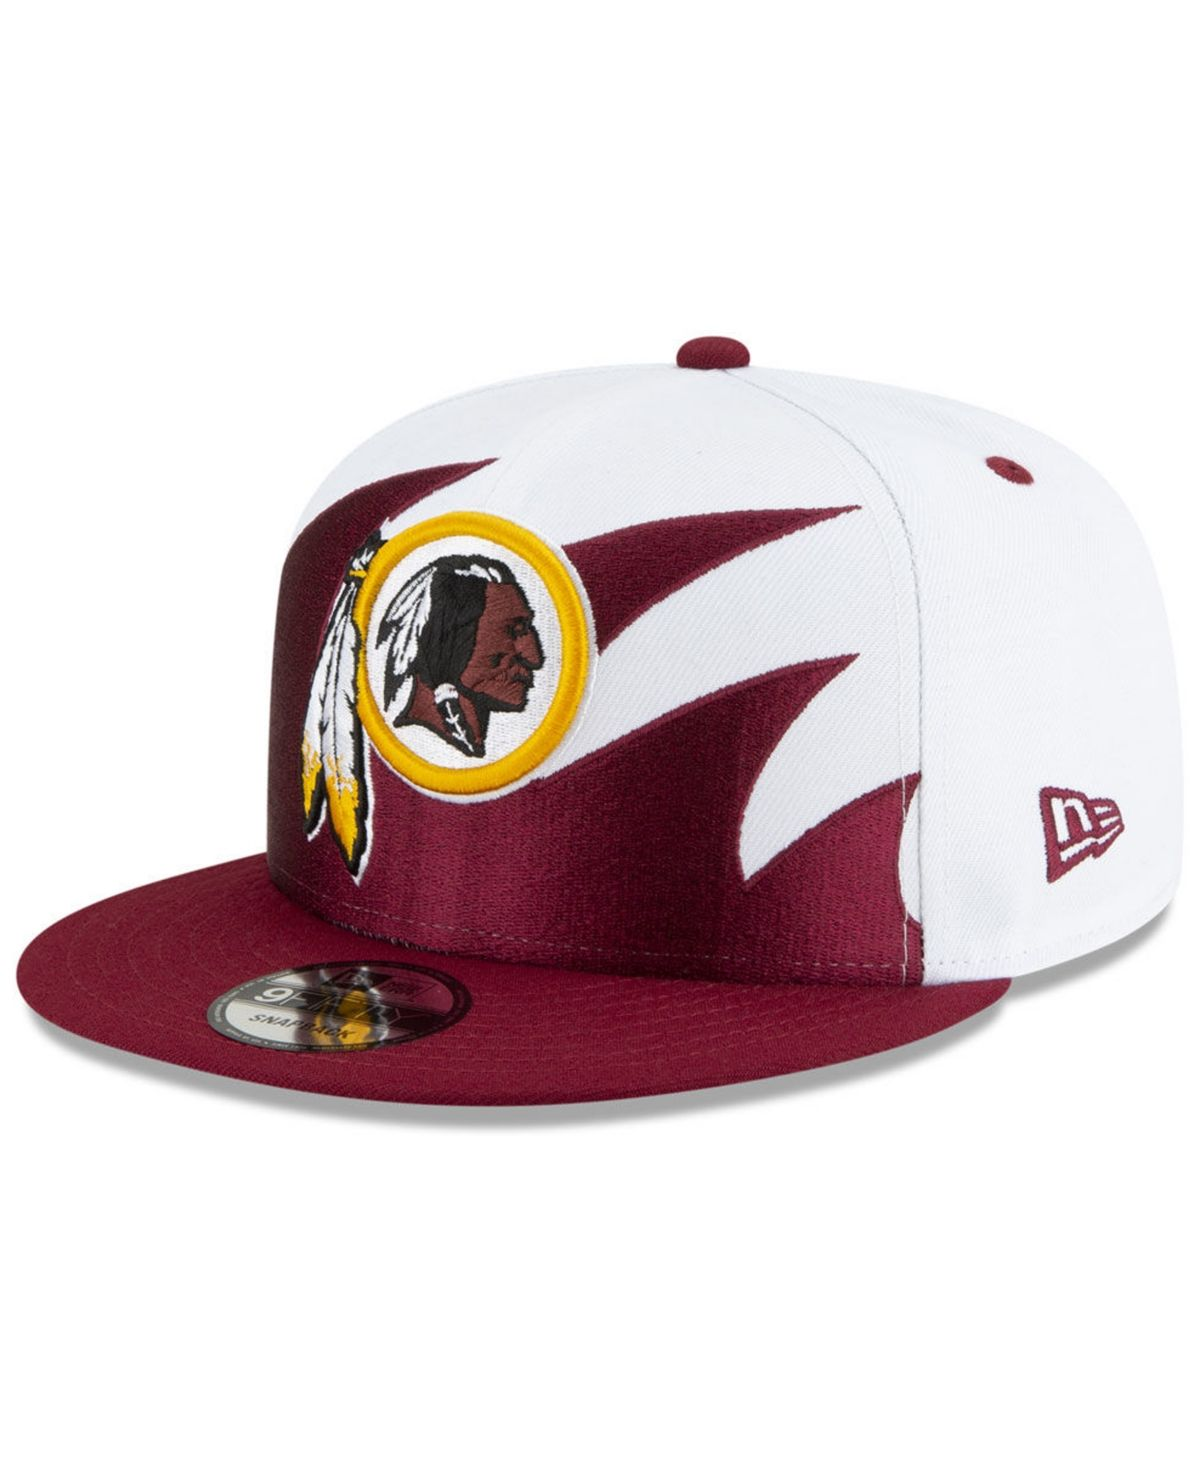 New Era Burgundy Oakland Raiders Shield Logo 9Fifty Snapback Hat